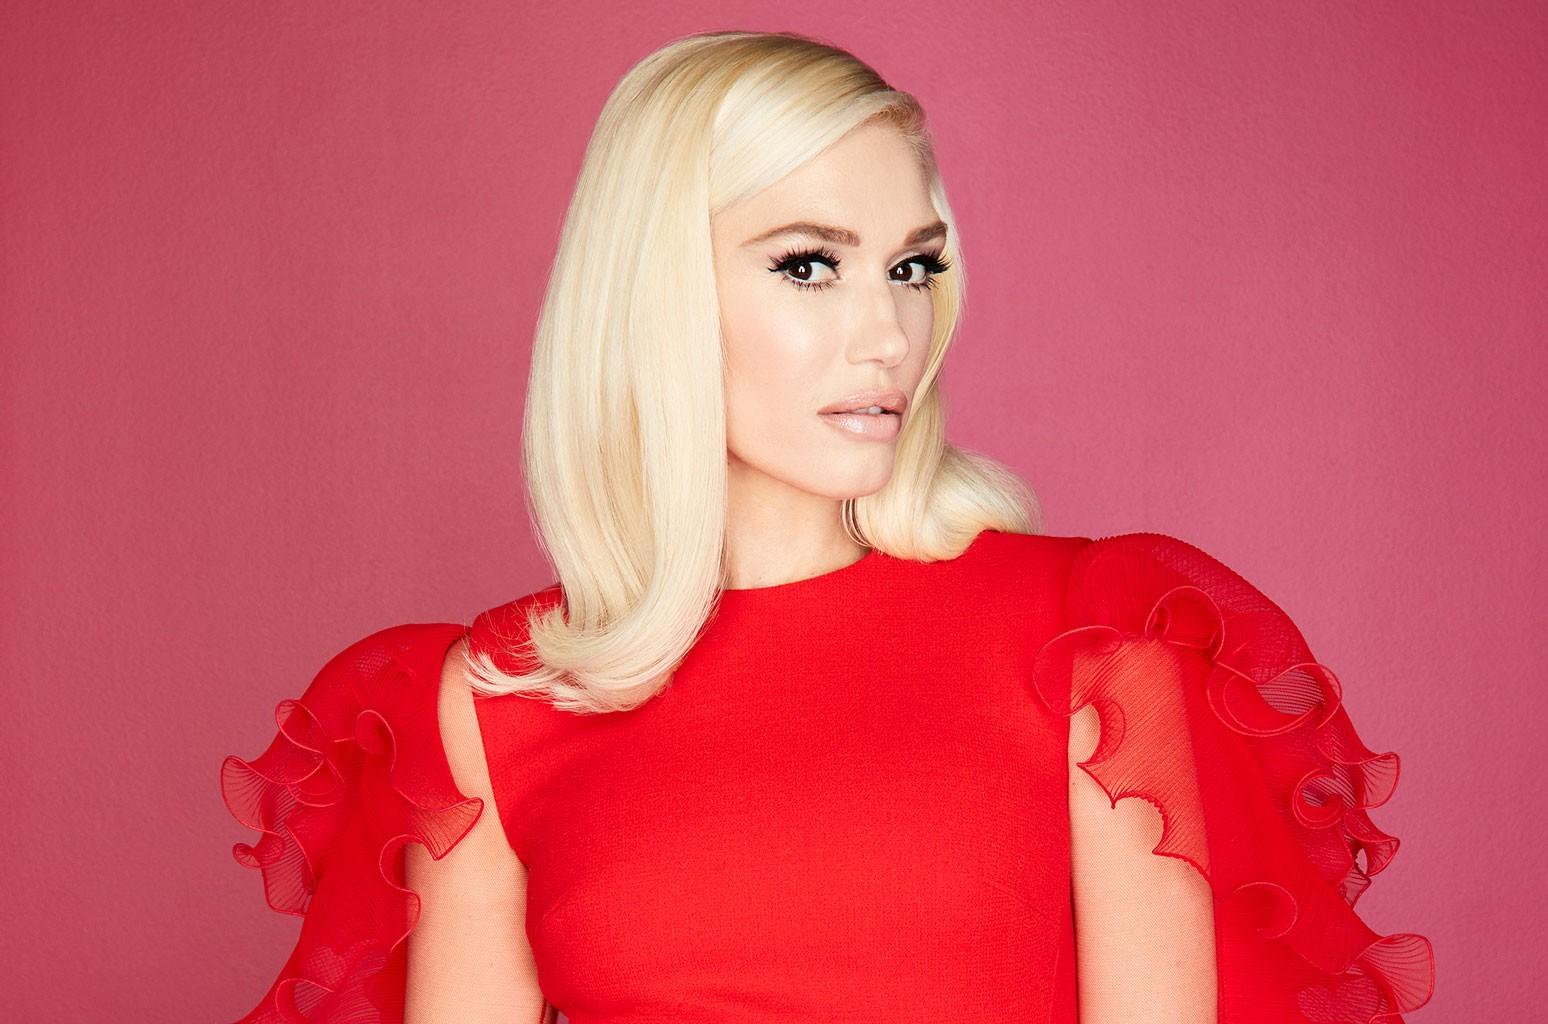 Gwen Stefani & Saweetie Go Back to School in High-Energy 'Slow Clap' Remix Video